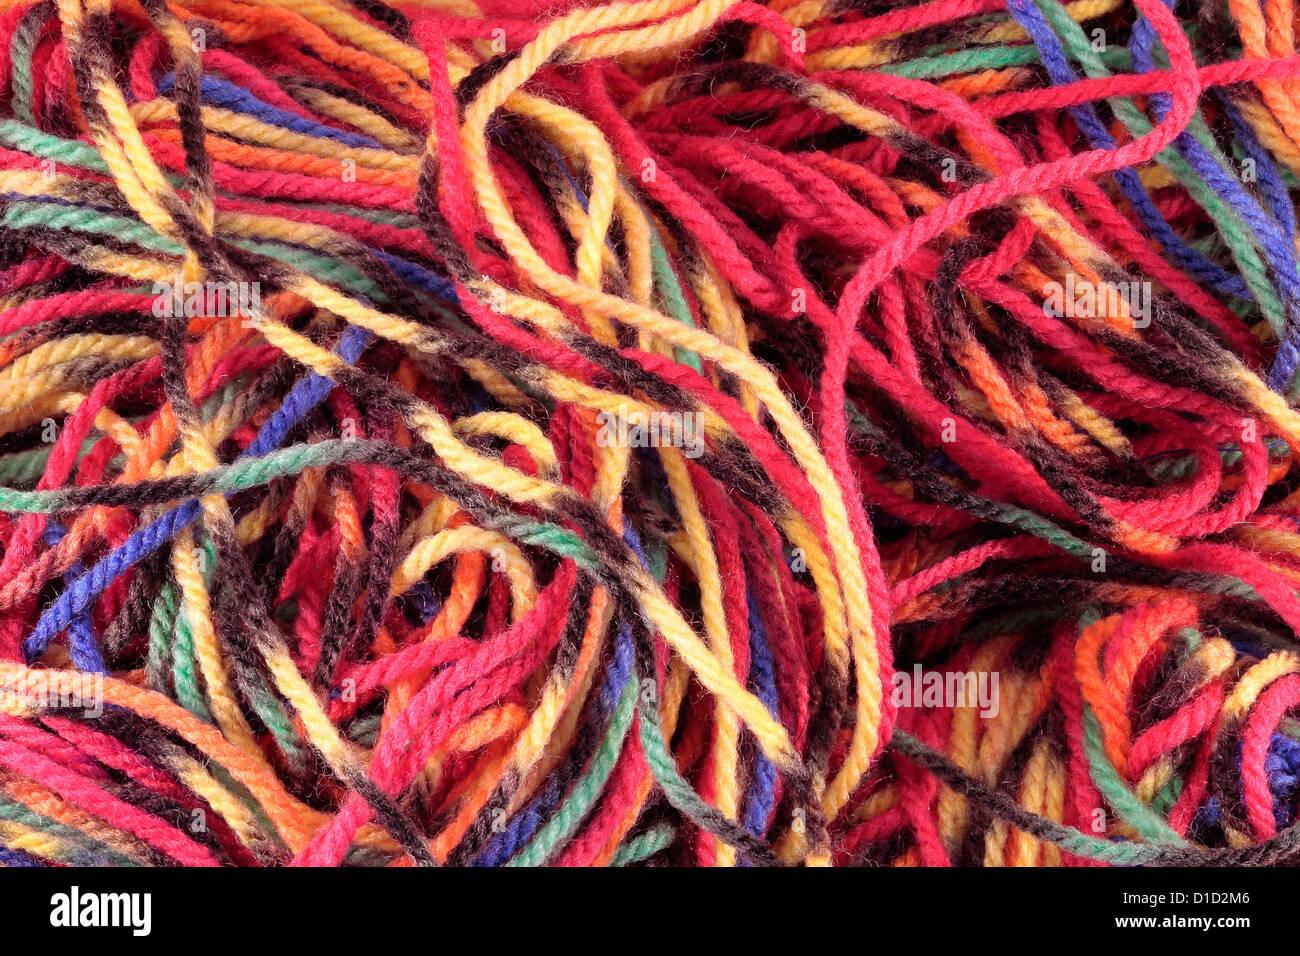 Bright Multicoloured Wool - Stock Image